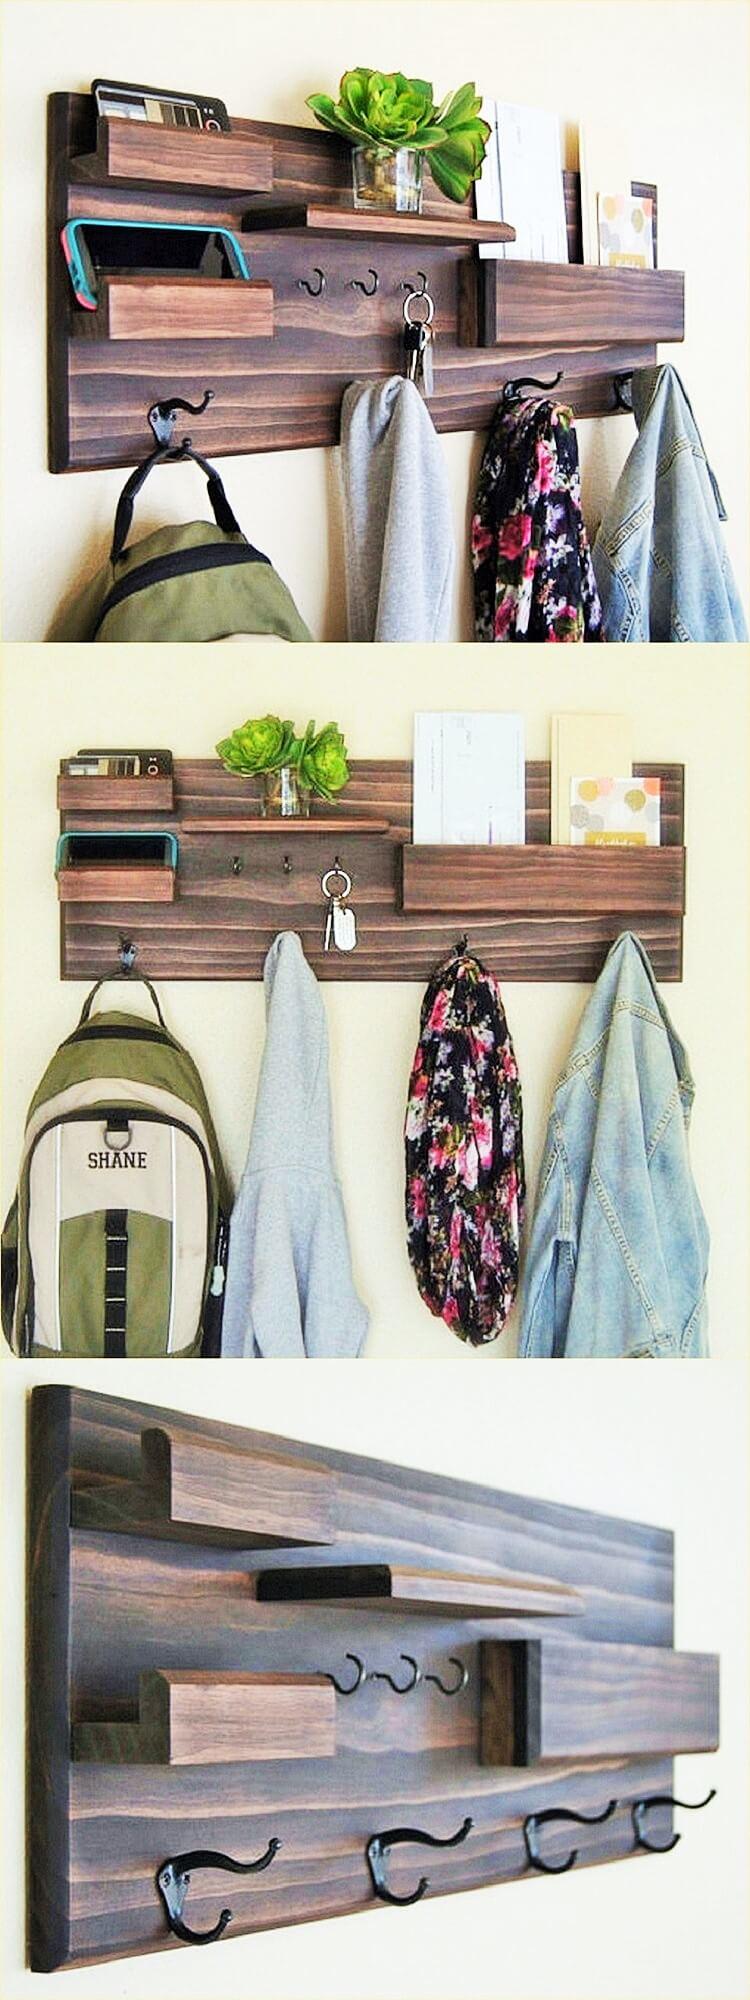 Wooden Pallets Ideas-14 (2)